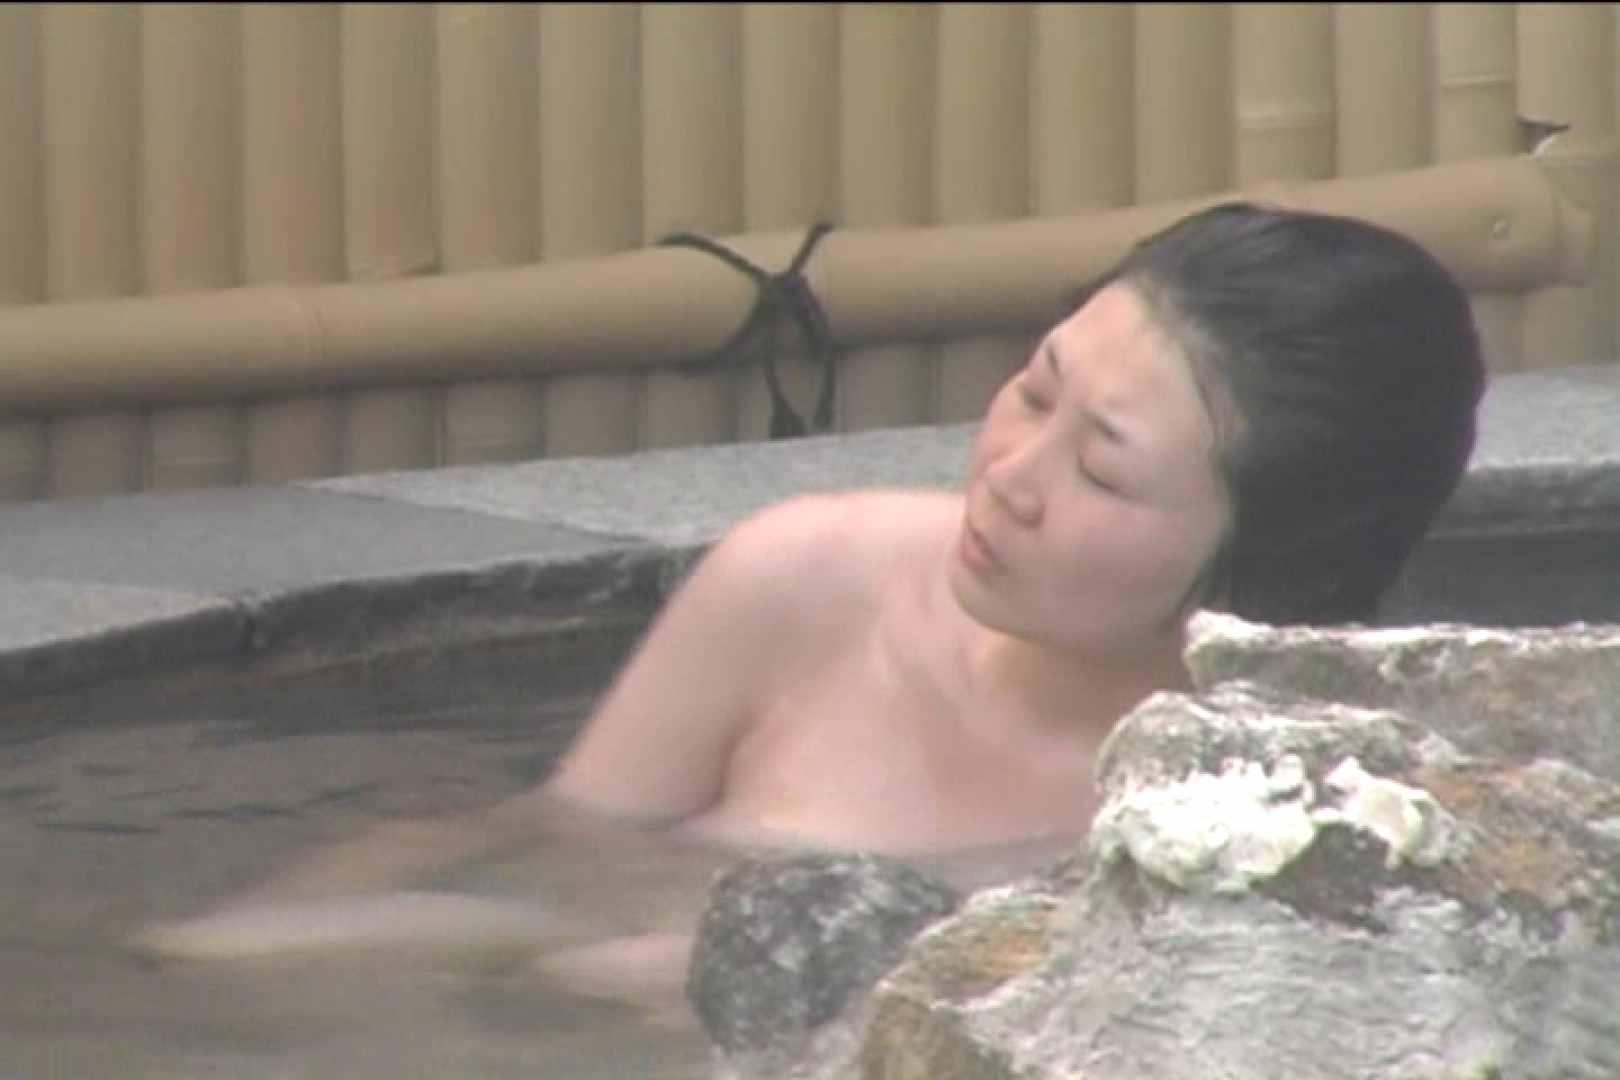 Aquaな露天風呂Vol.531 盗撮シリーズ | 露天風呂編  85PIX 59